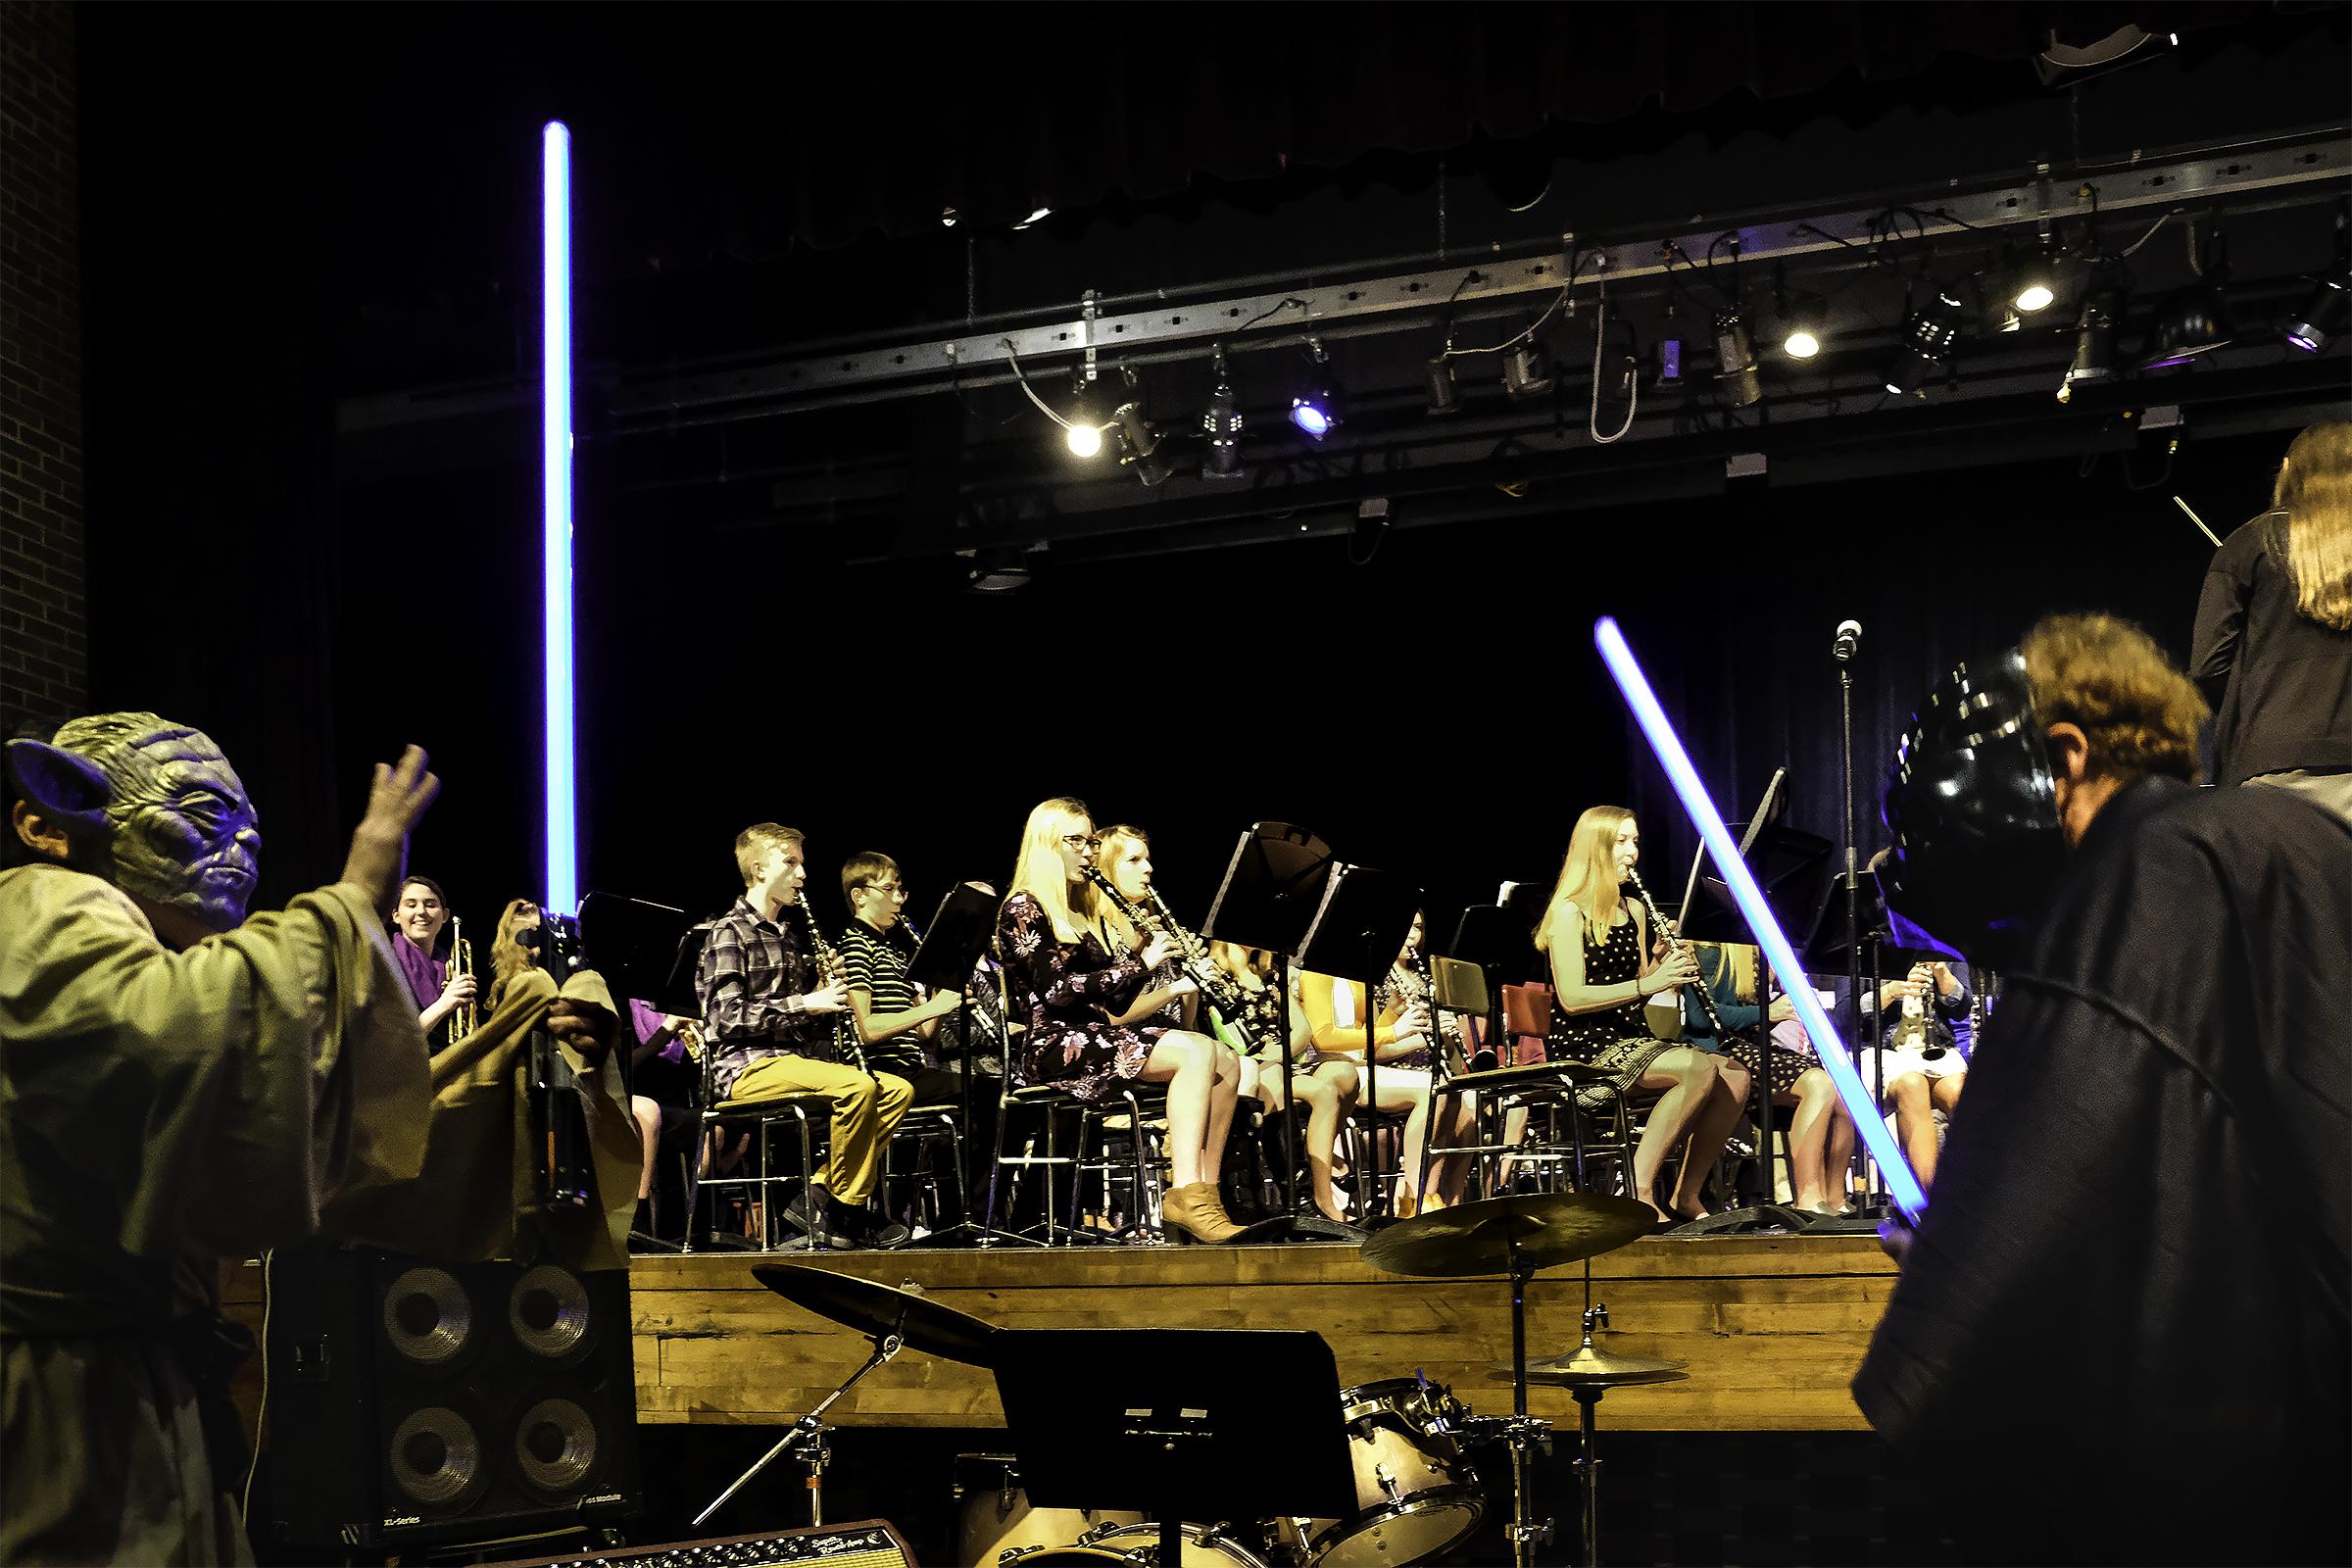 Yoda a Darth Vader light saber dual in front of band.